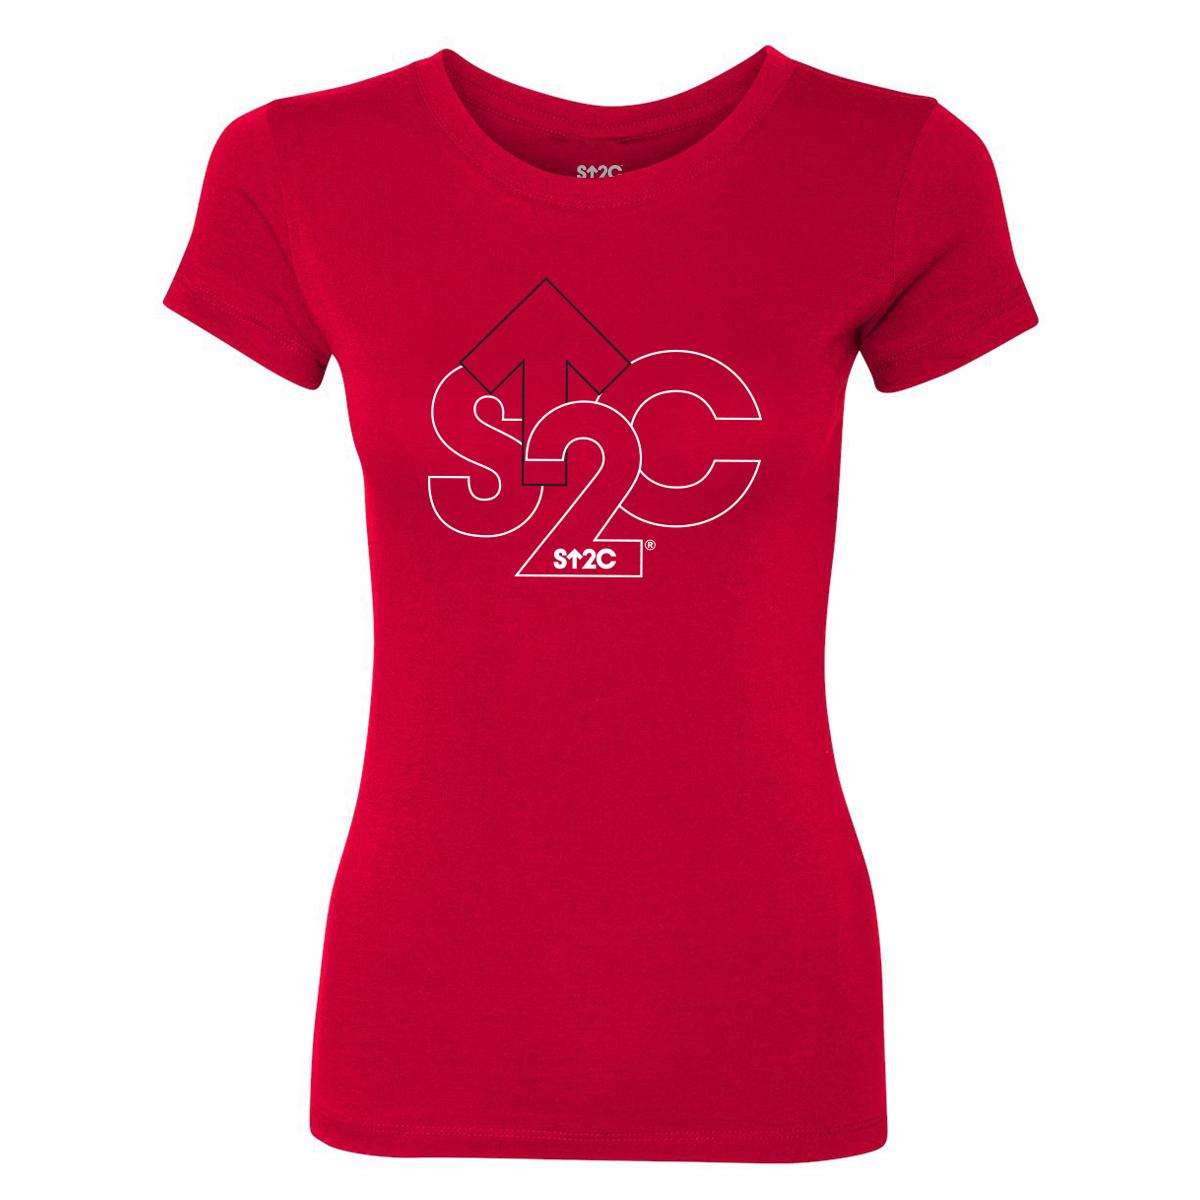 SU2C Outline Logo Women's T-Shirt (Red)